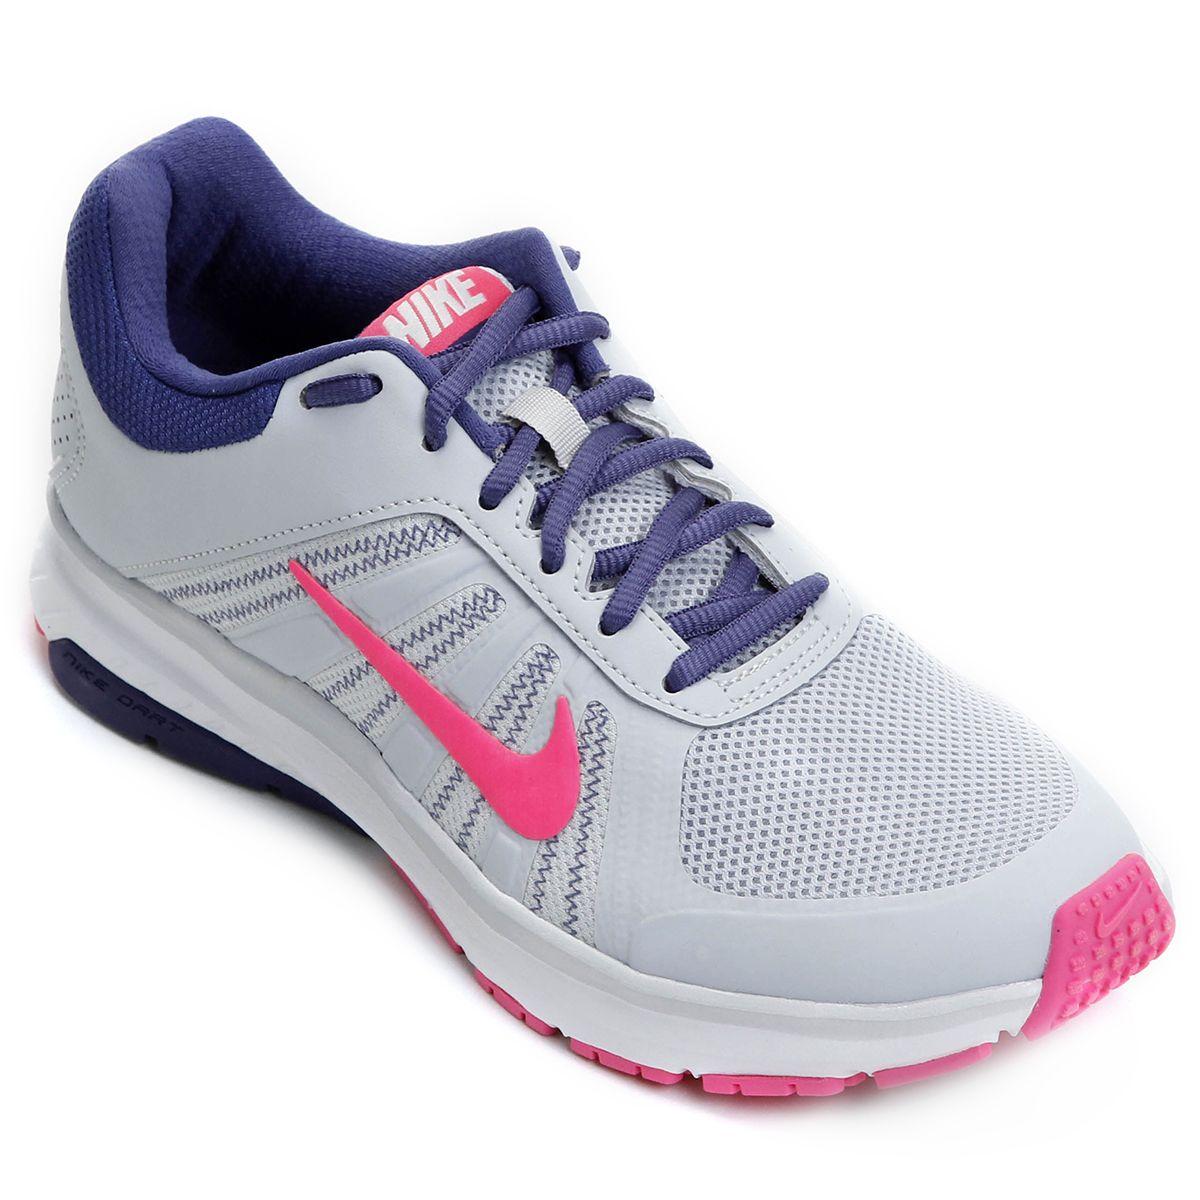 97b1d75684c Tênis Nike Dart 12 MSL Feminino - Cinza e Rosa